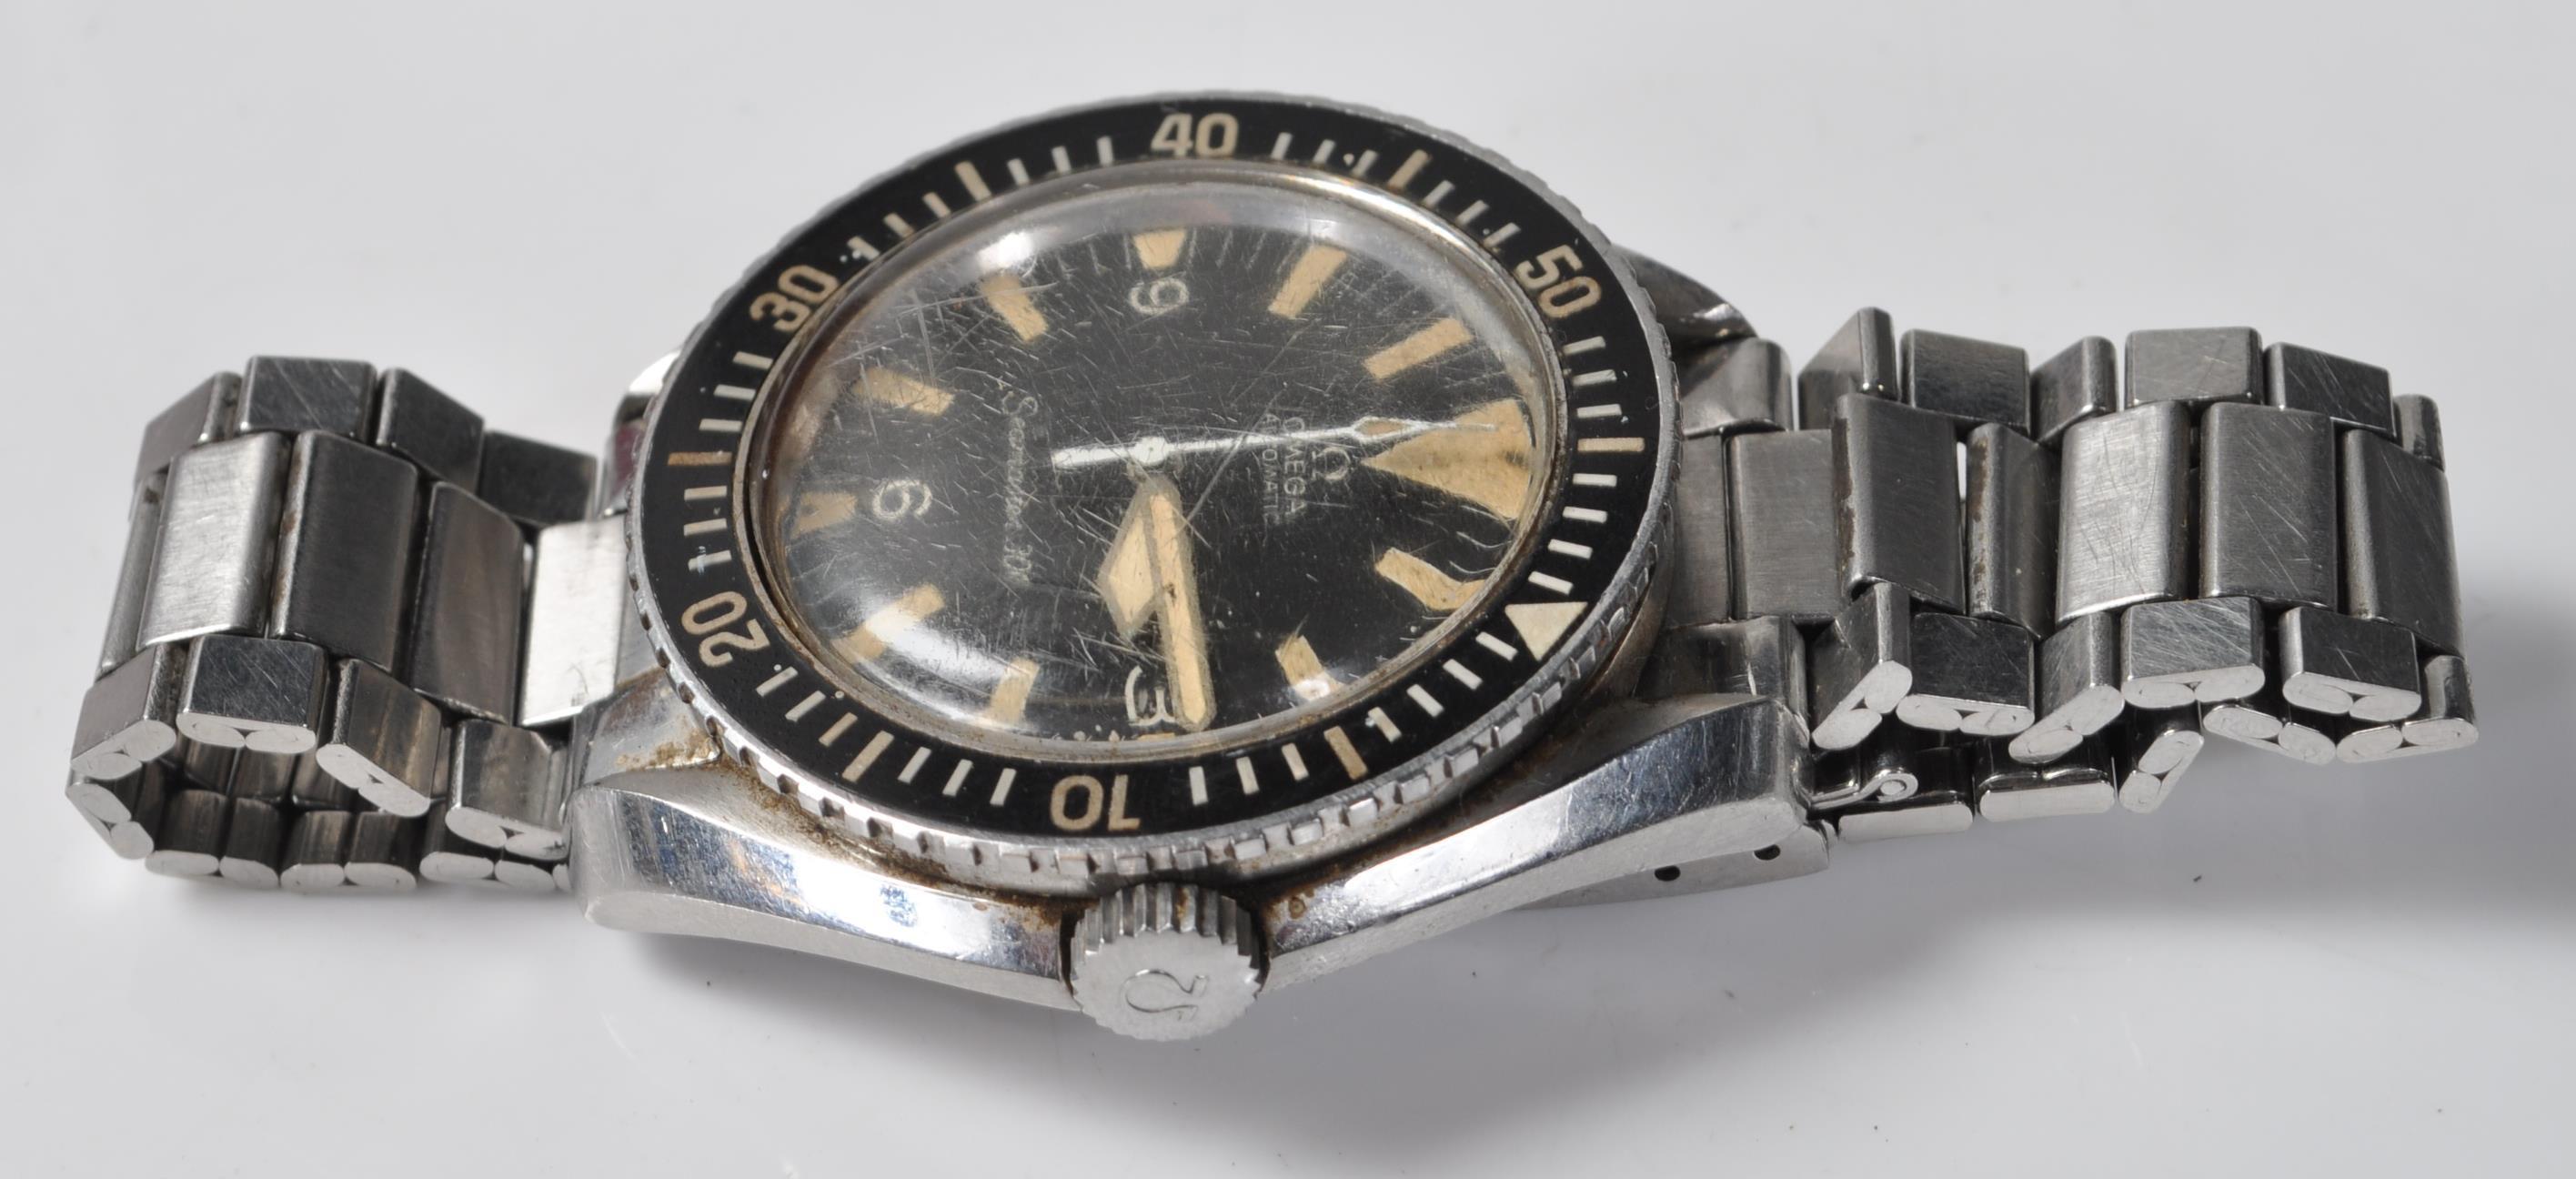 VINTAGE 1960'S OMEGA SEAMASTER 300 BIG TRIANGLE WRIST WATCH - Image 7 of 14